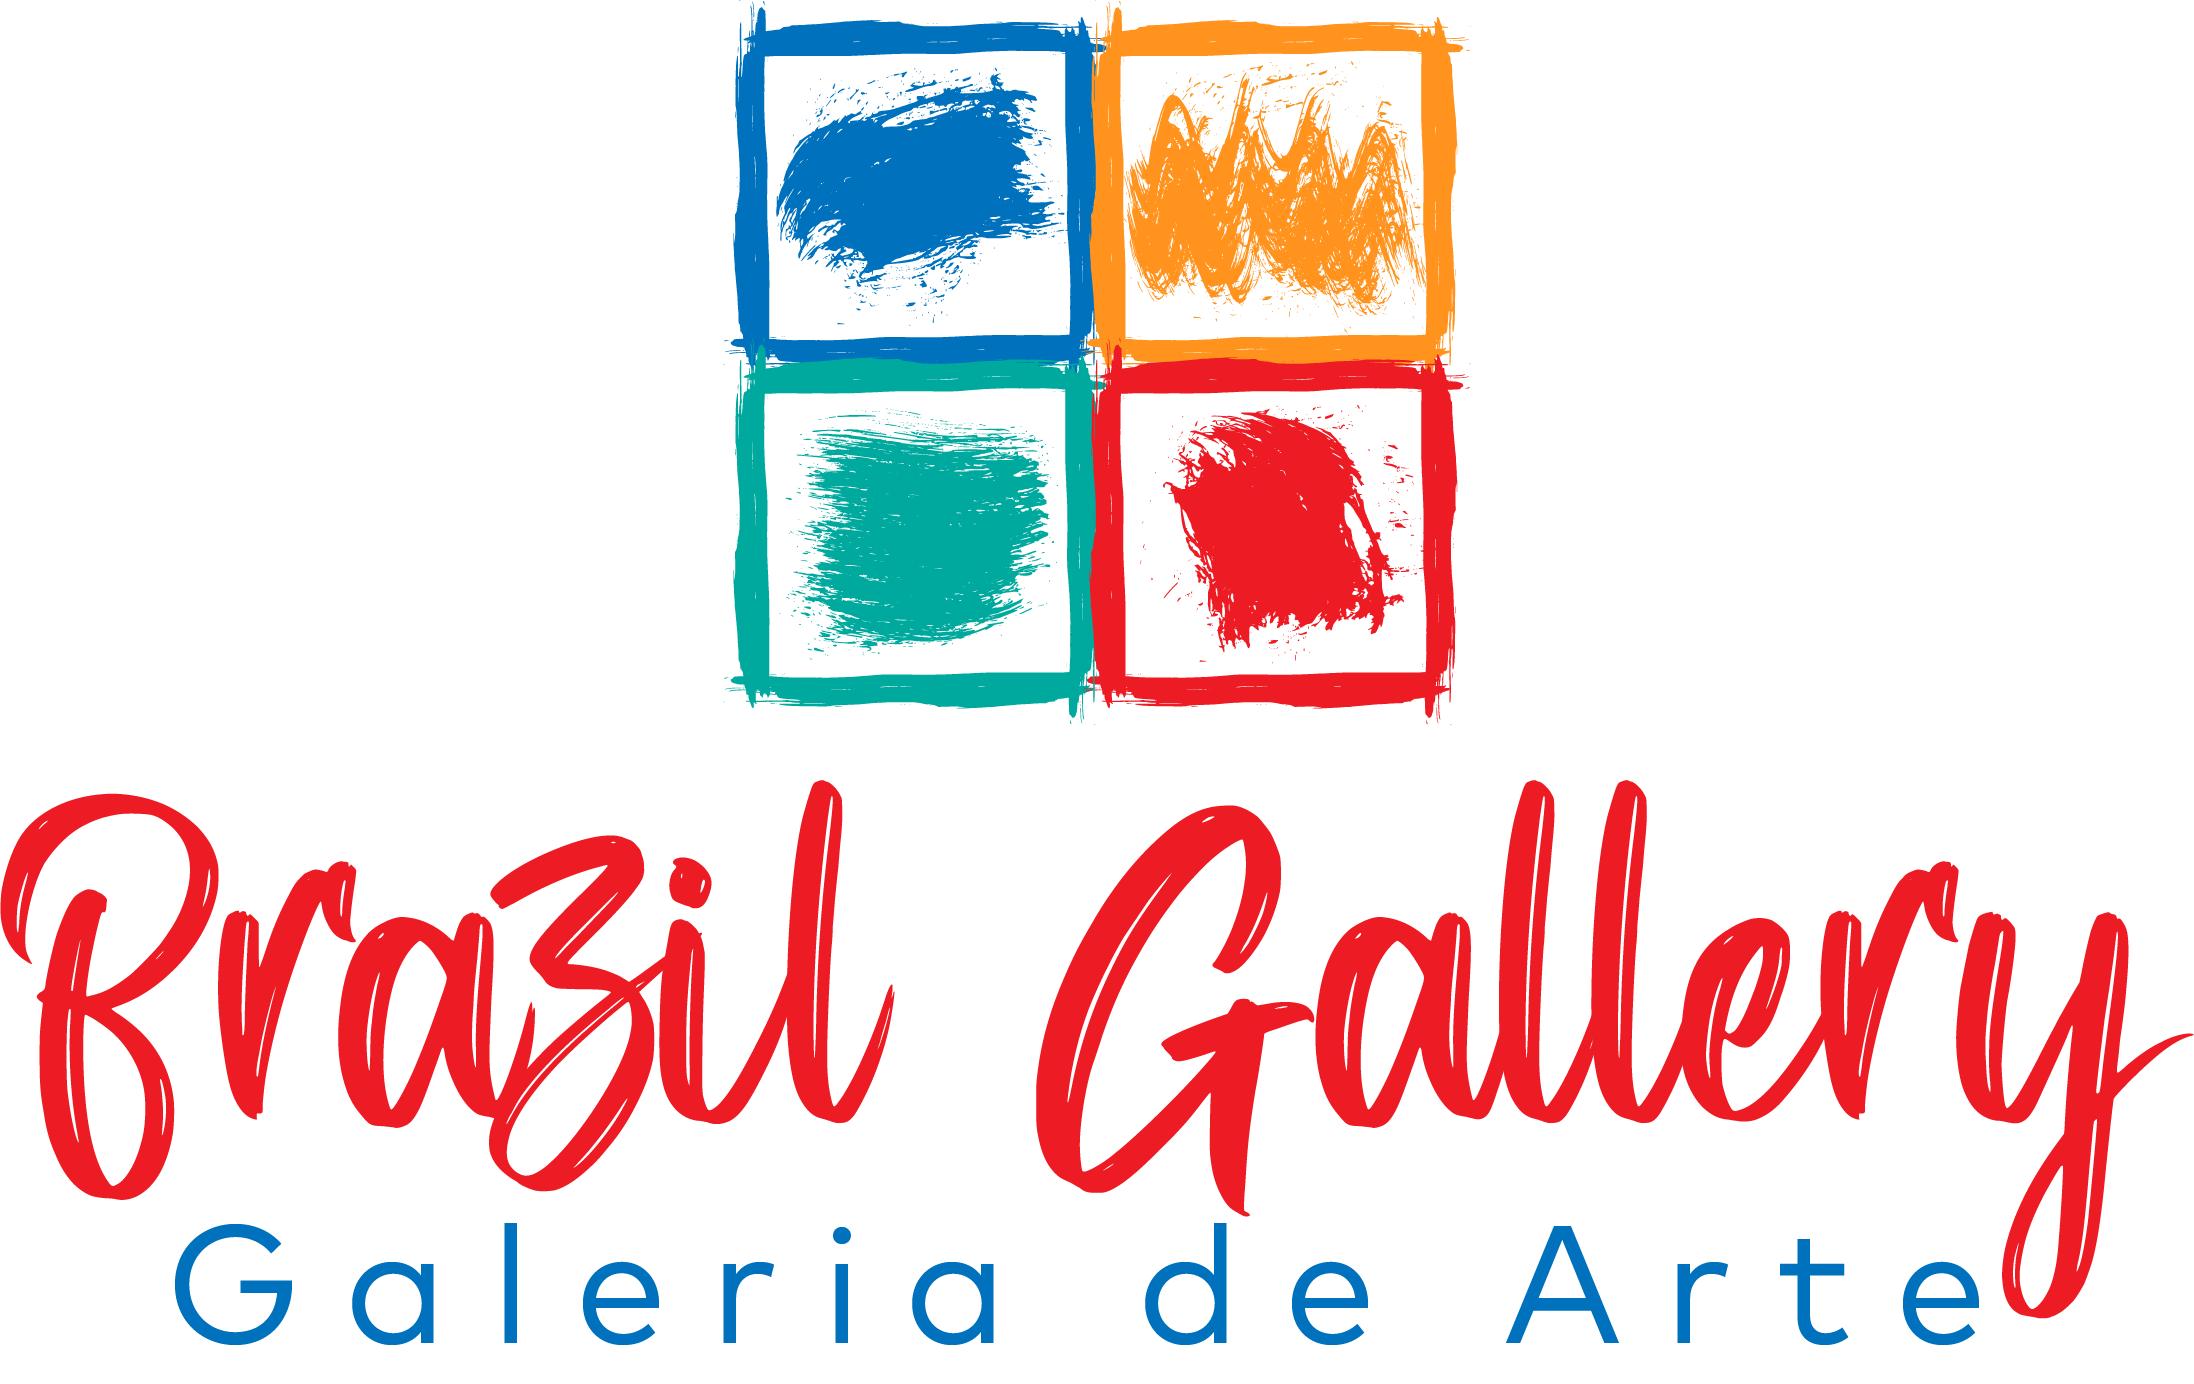 Brazil Gallery